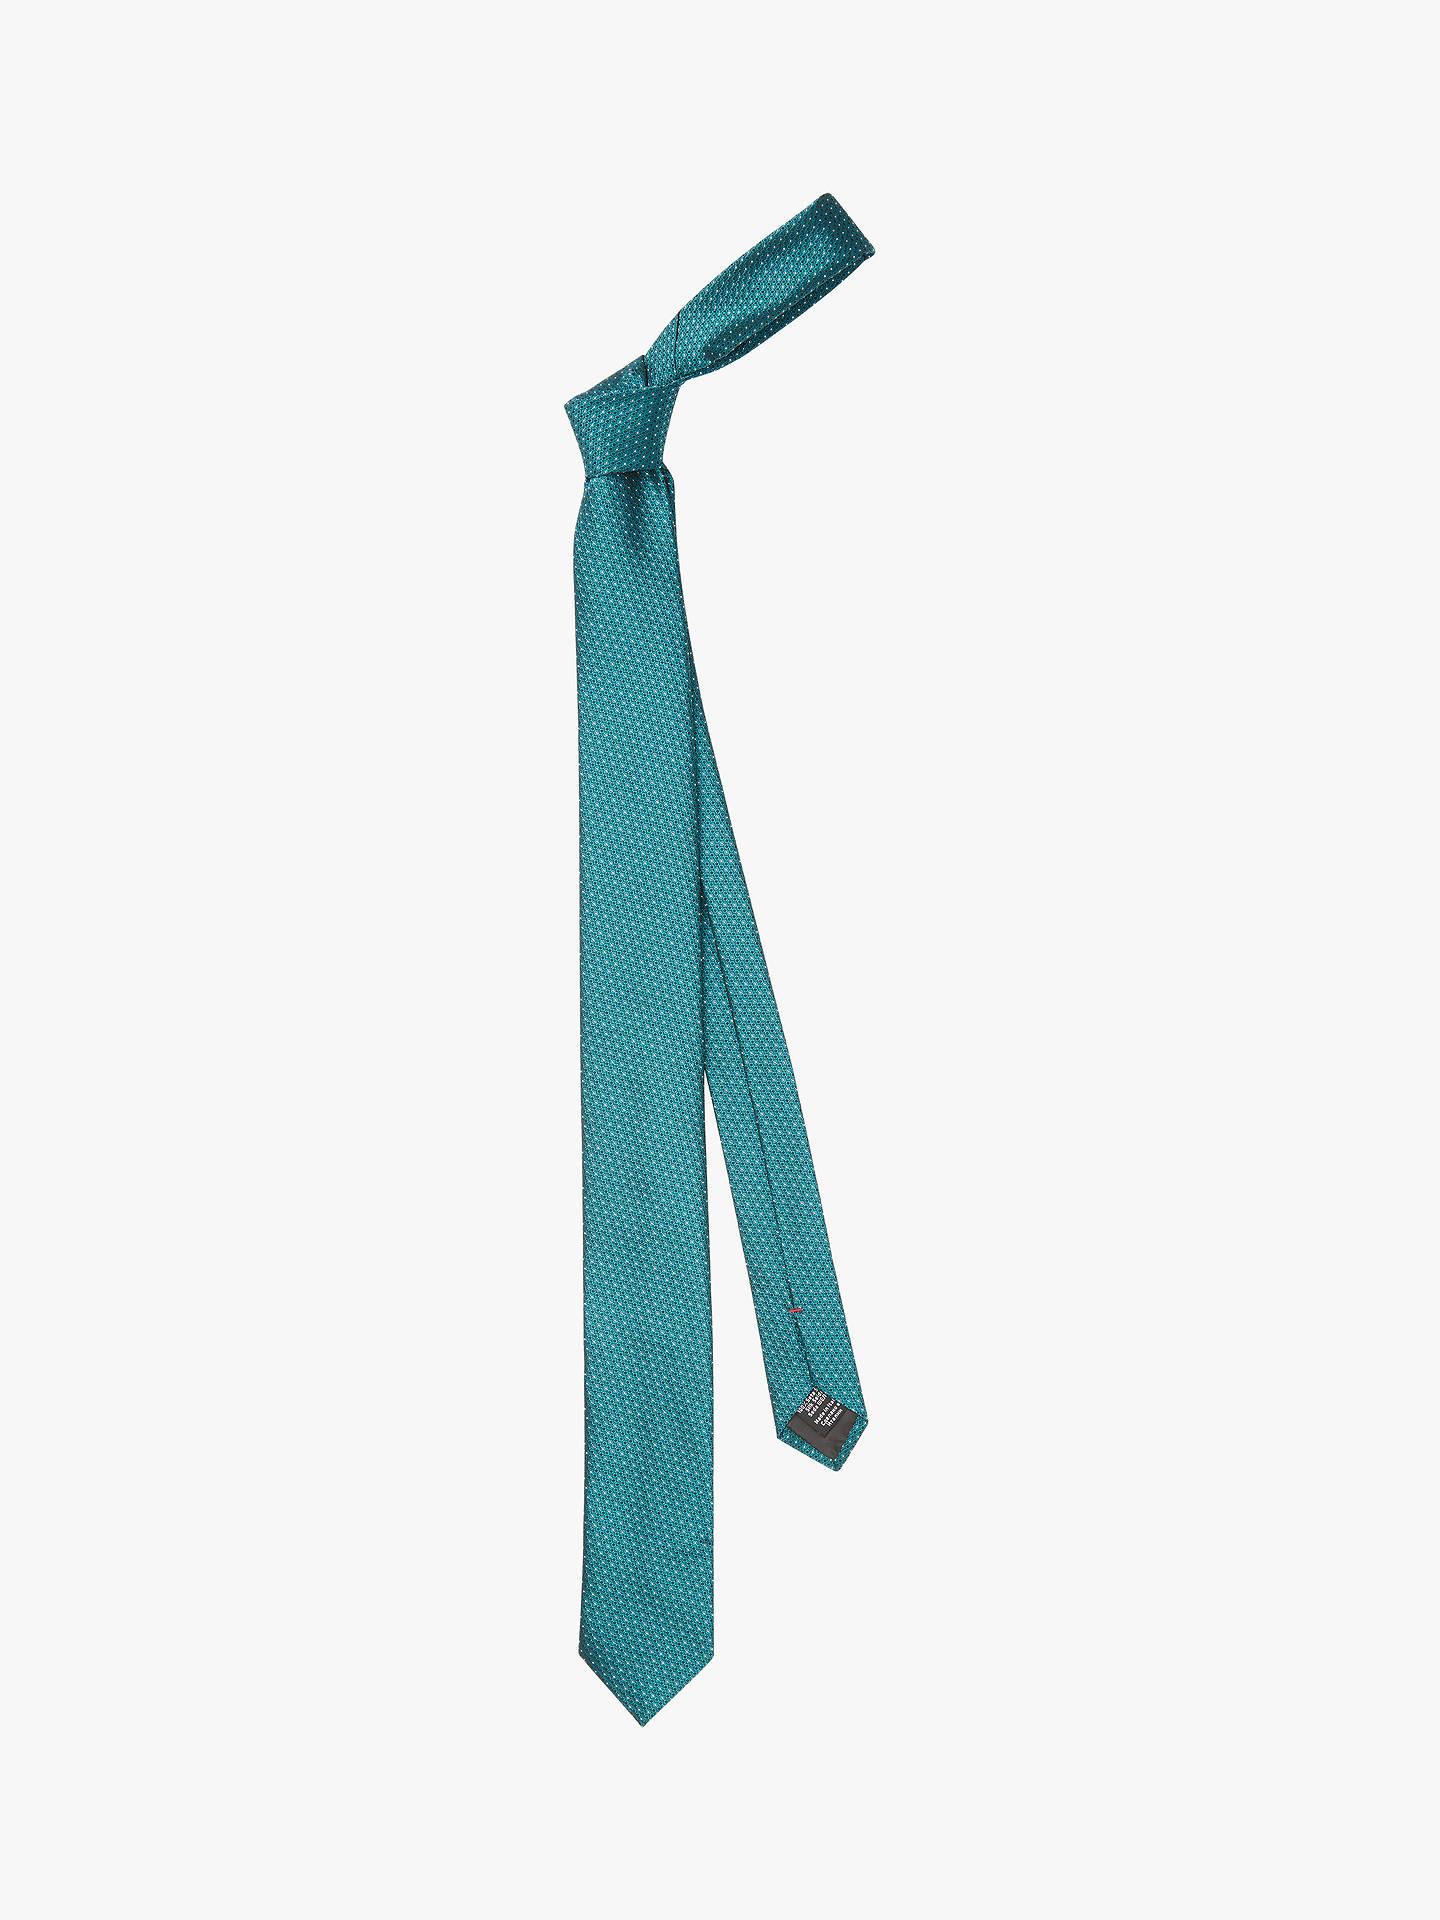 9a0b18edce Buy HUGO by Hugo Boss Jacquard Micro Pattern Silk Tie, Green Online at  johnlewis.